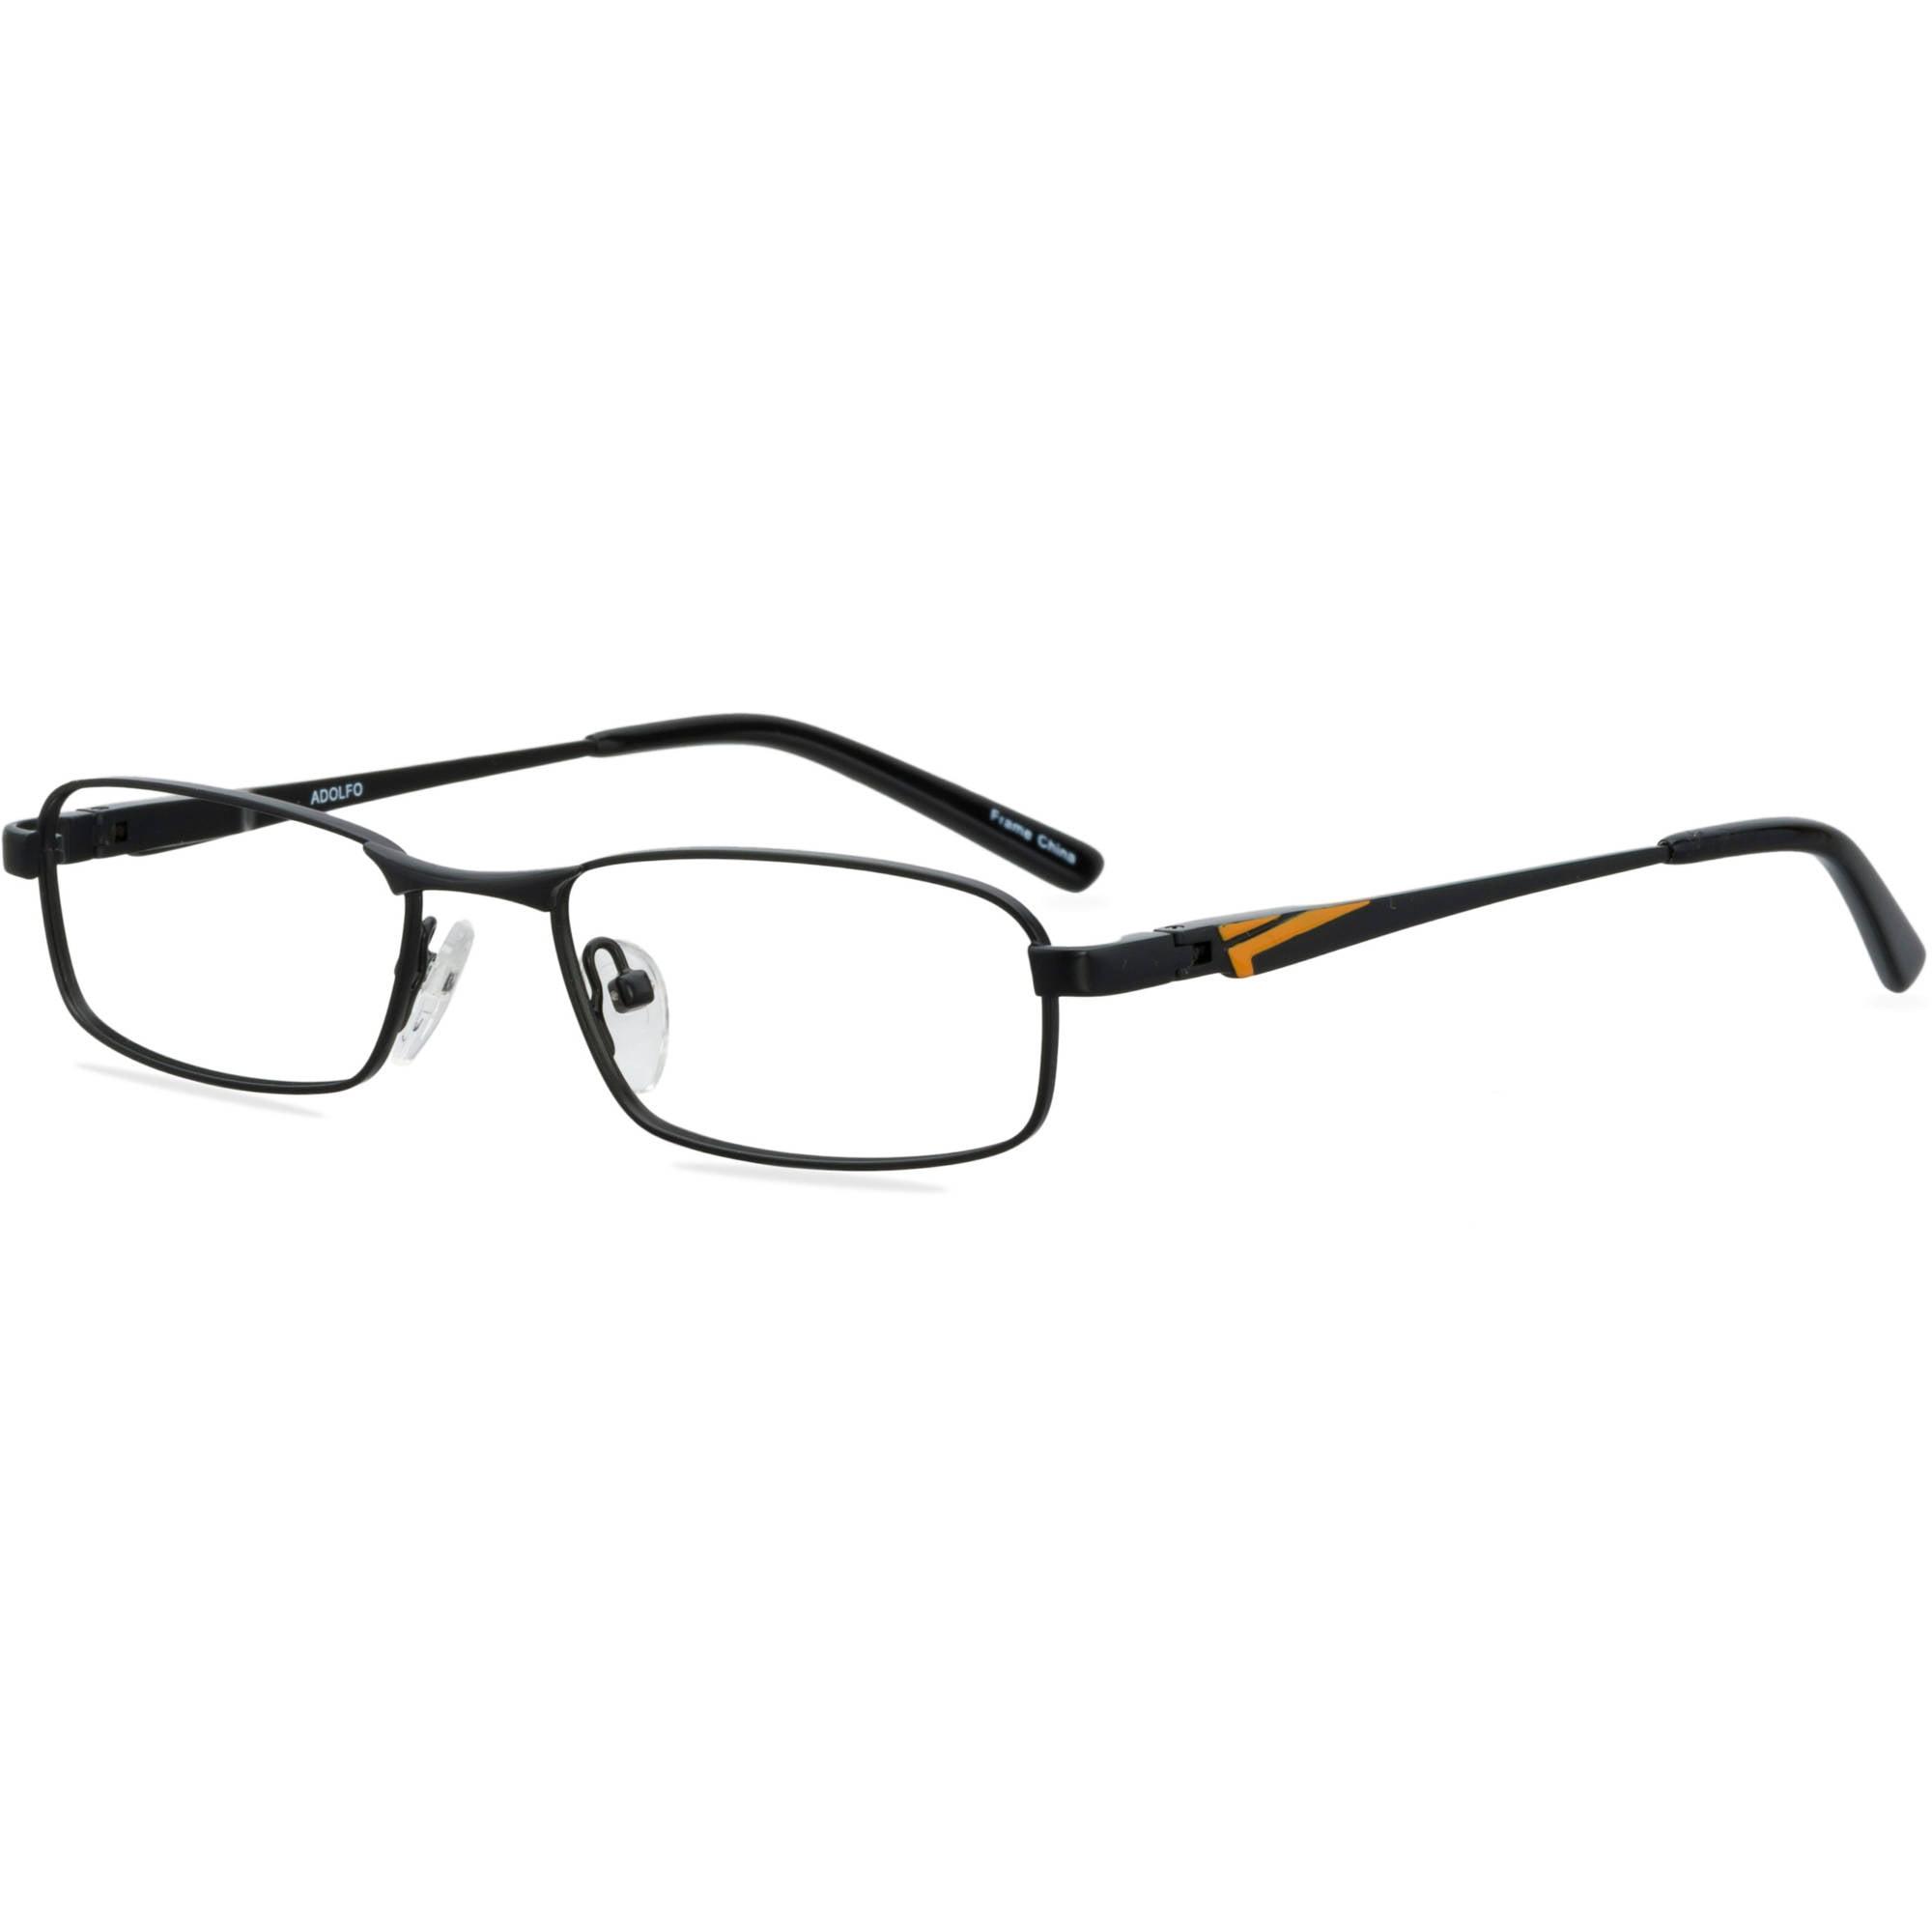 ADOLFO Boys Prescription Glasses, Touchdown Black